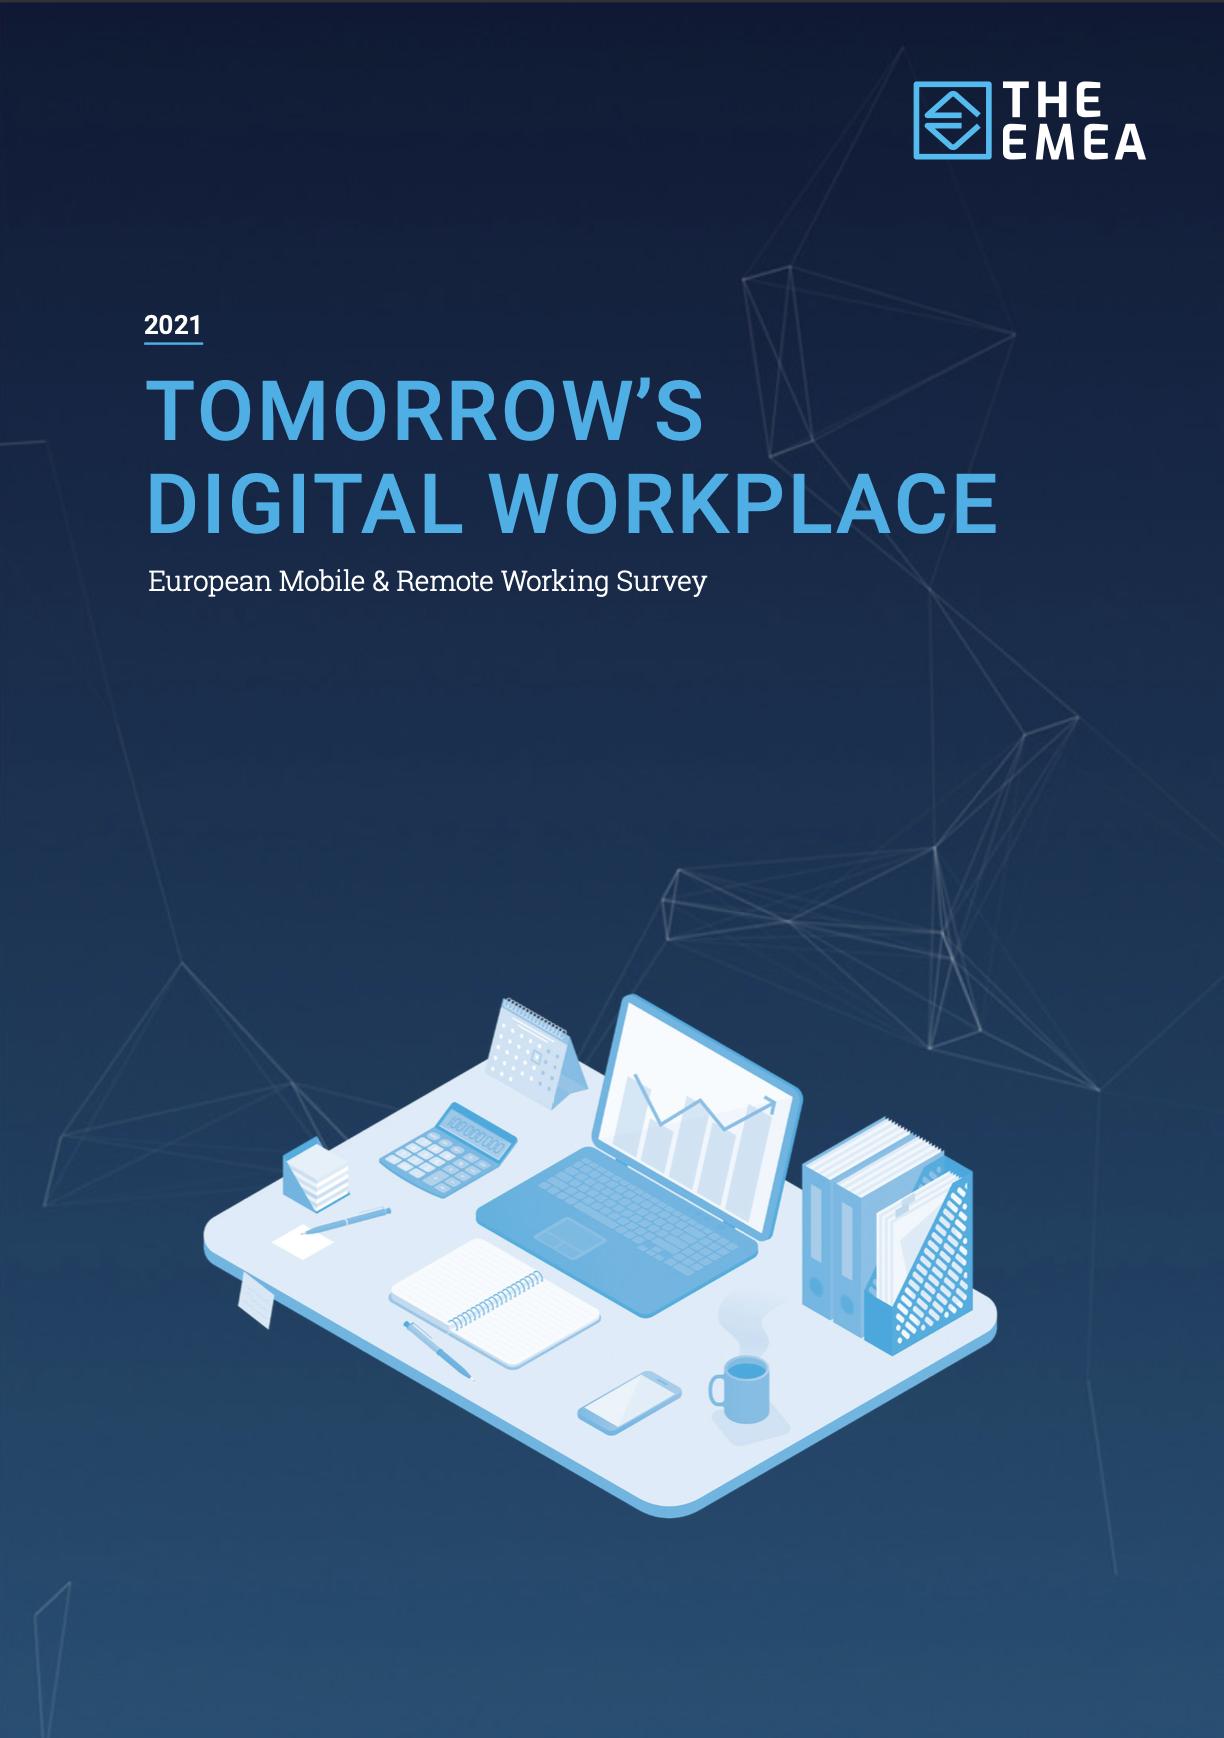 European Mobile & Remote Working Survey